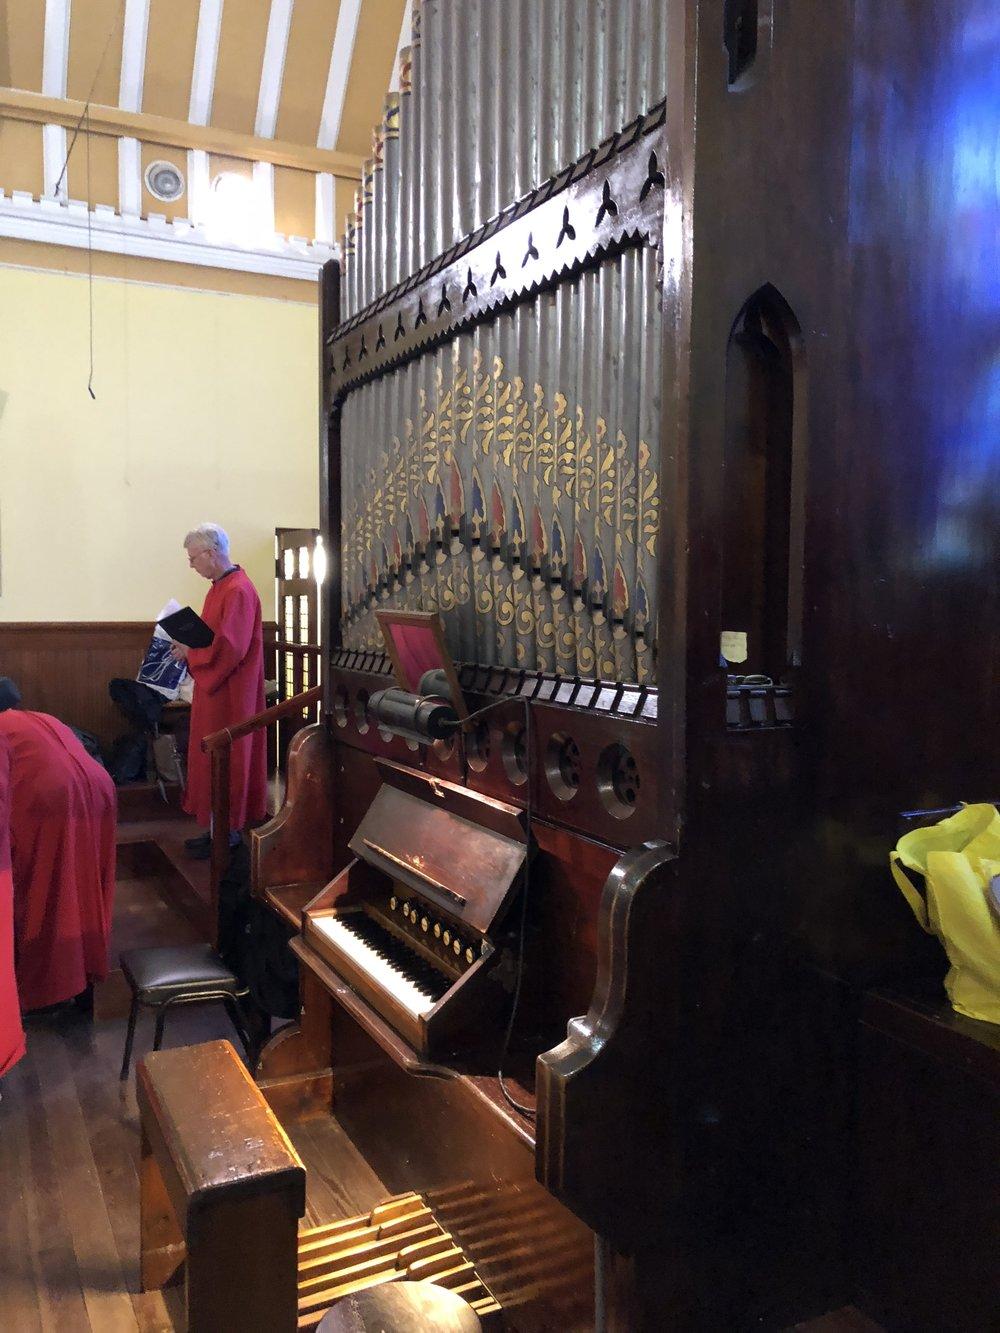 The tiny pipe organ